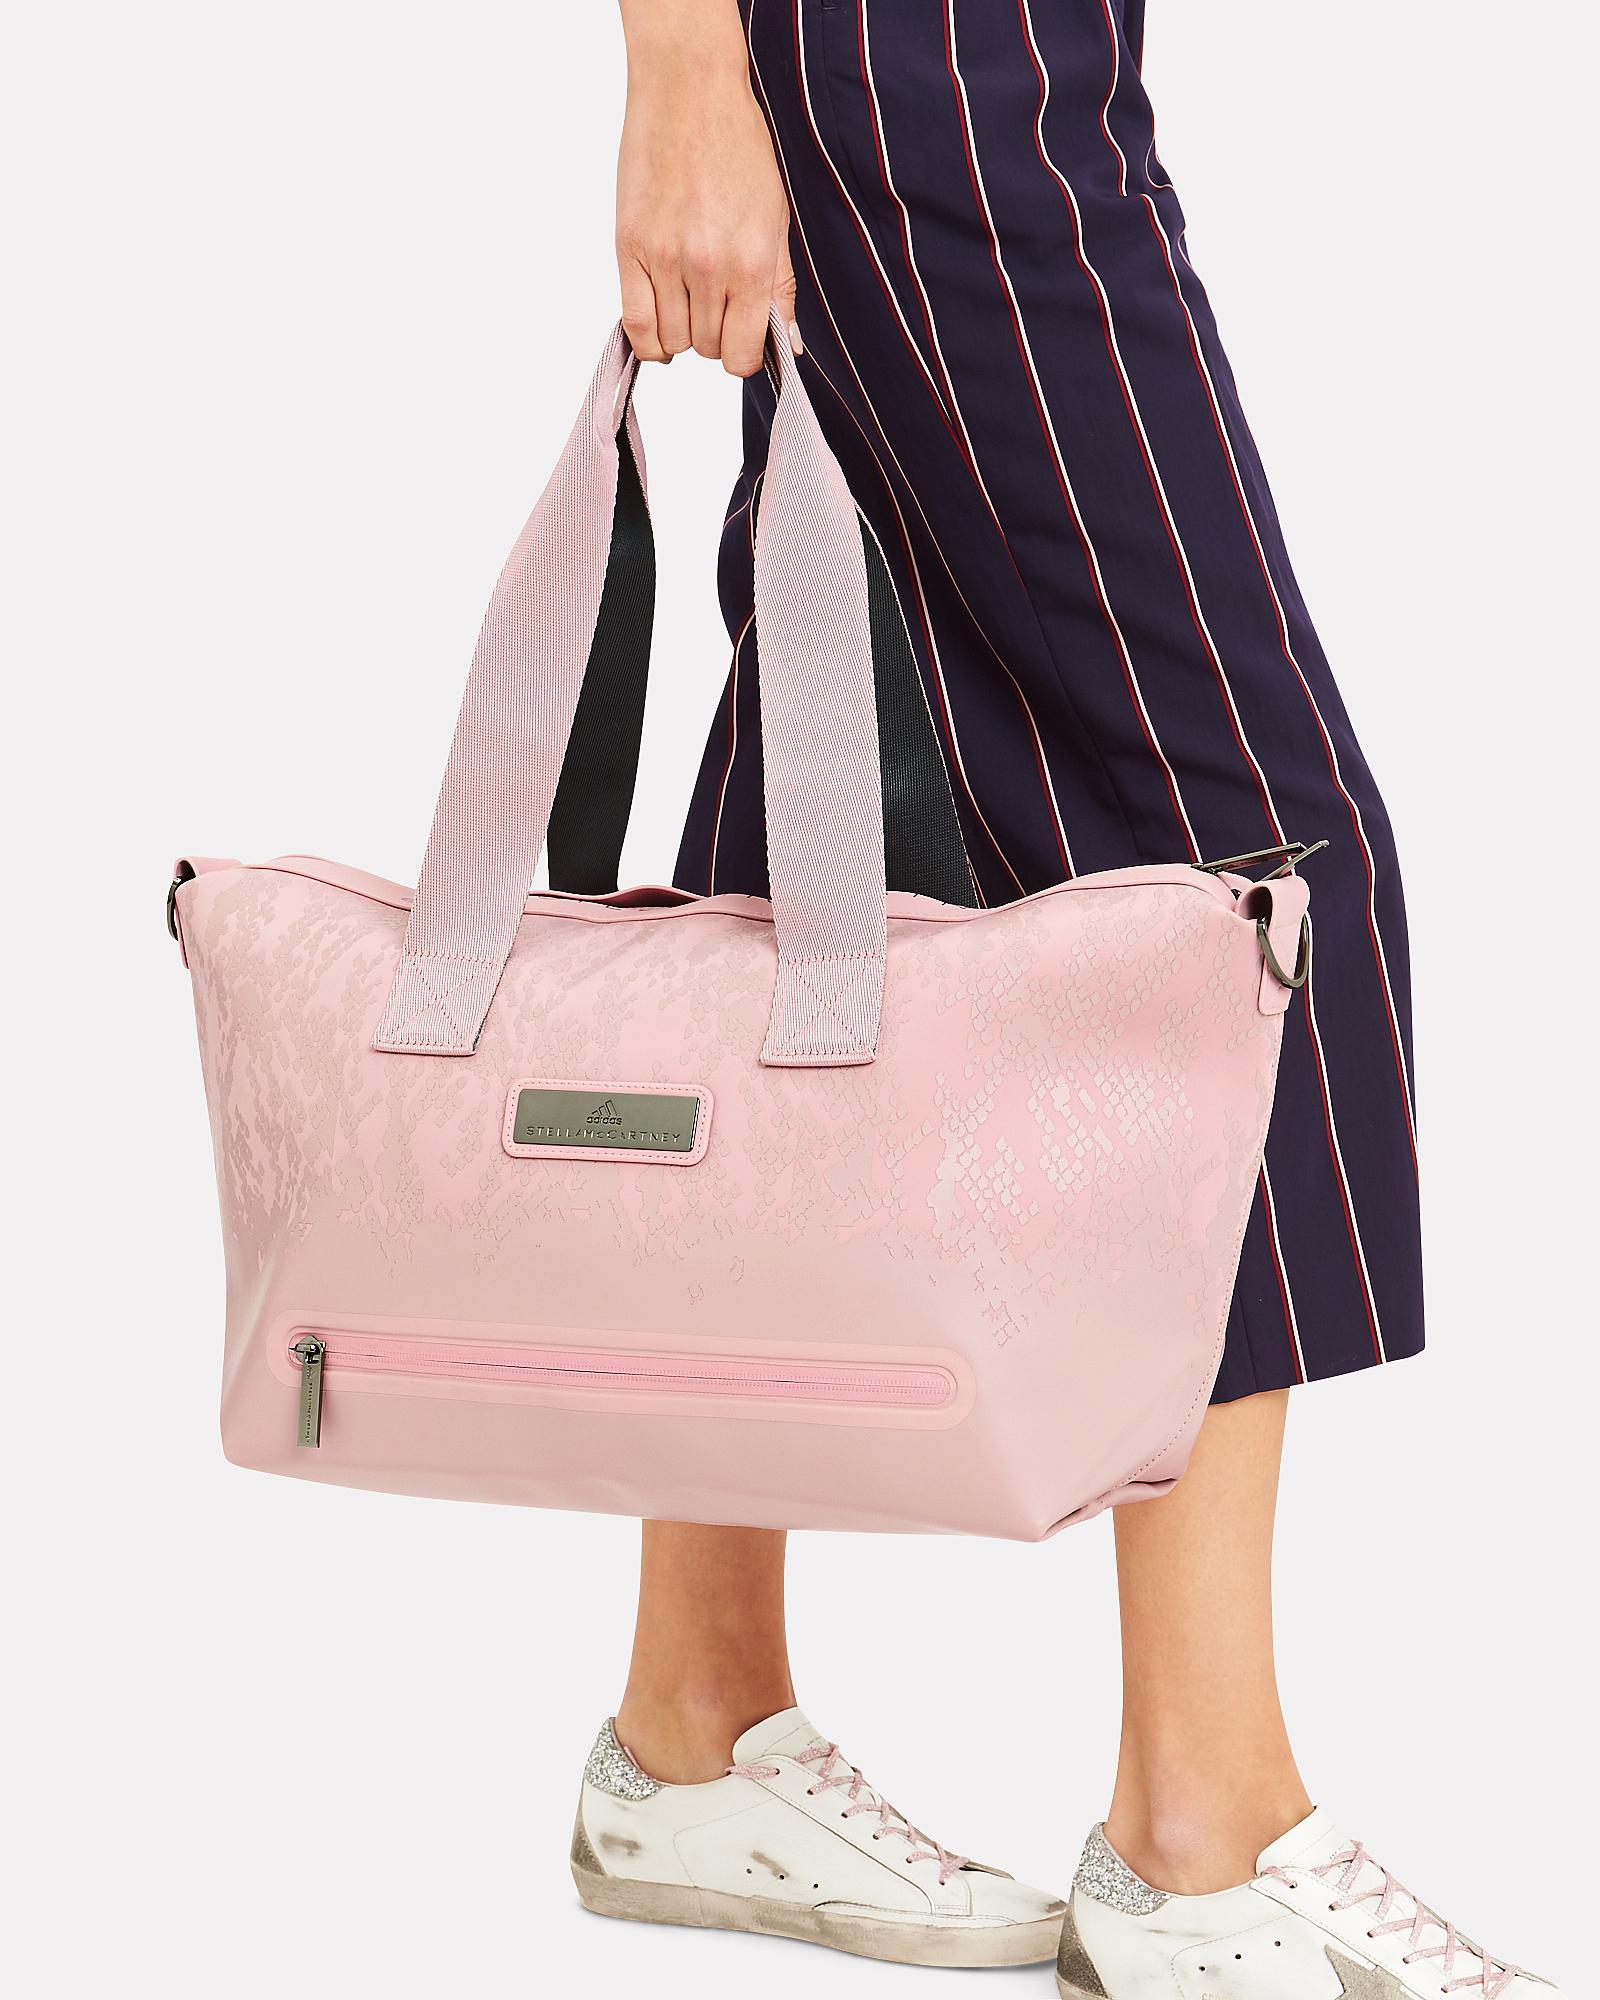 0bb4dabc11 Lyst - adidas By Stella McCartney Small Studio Pink Bag in Pink